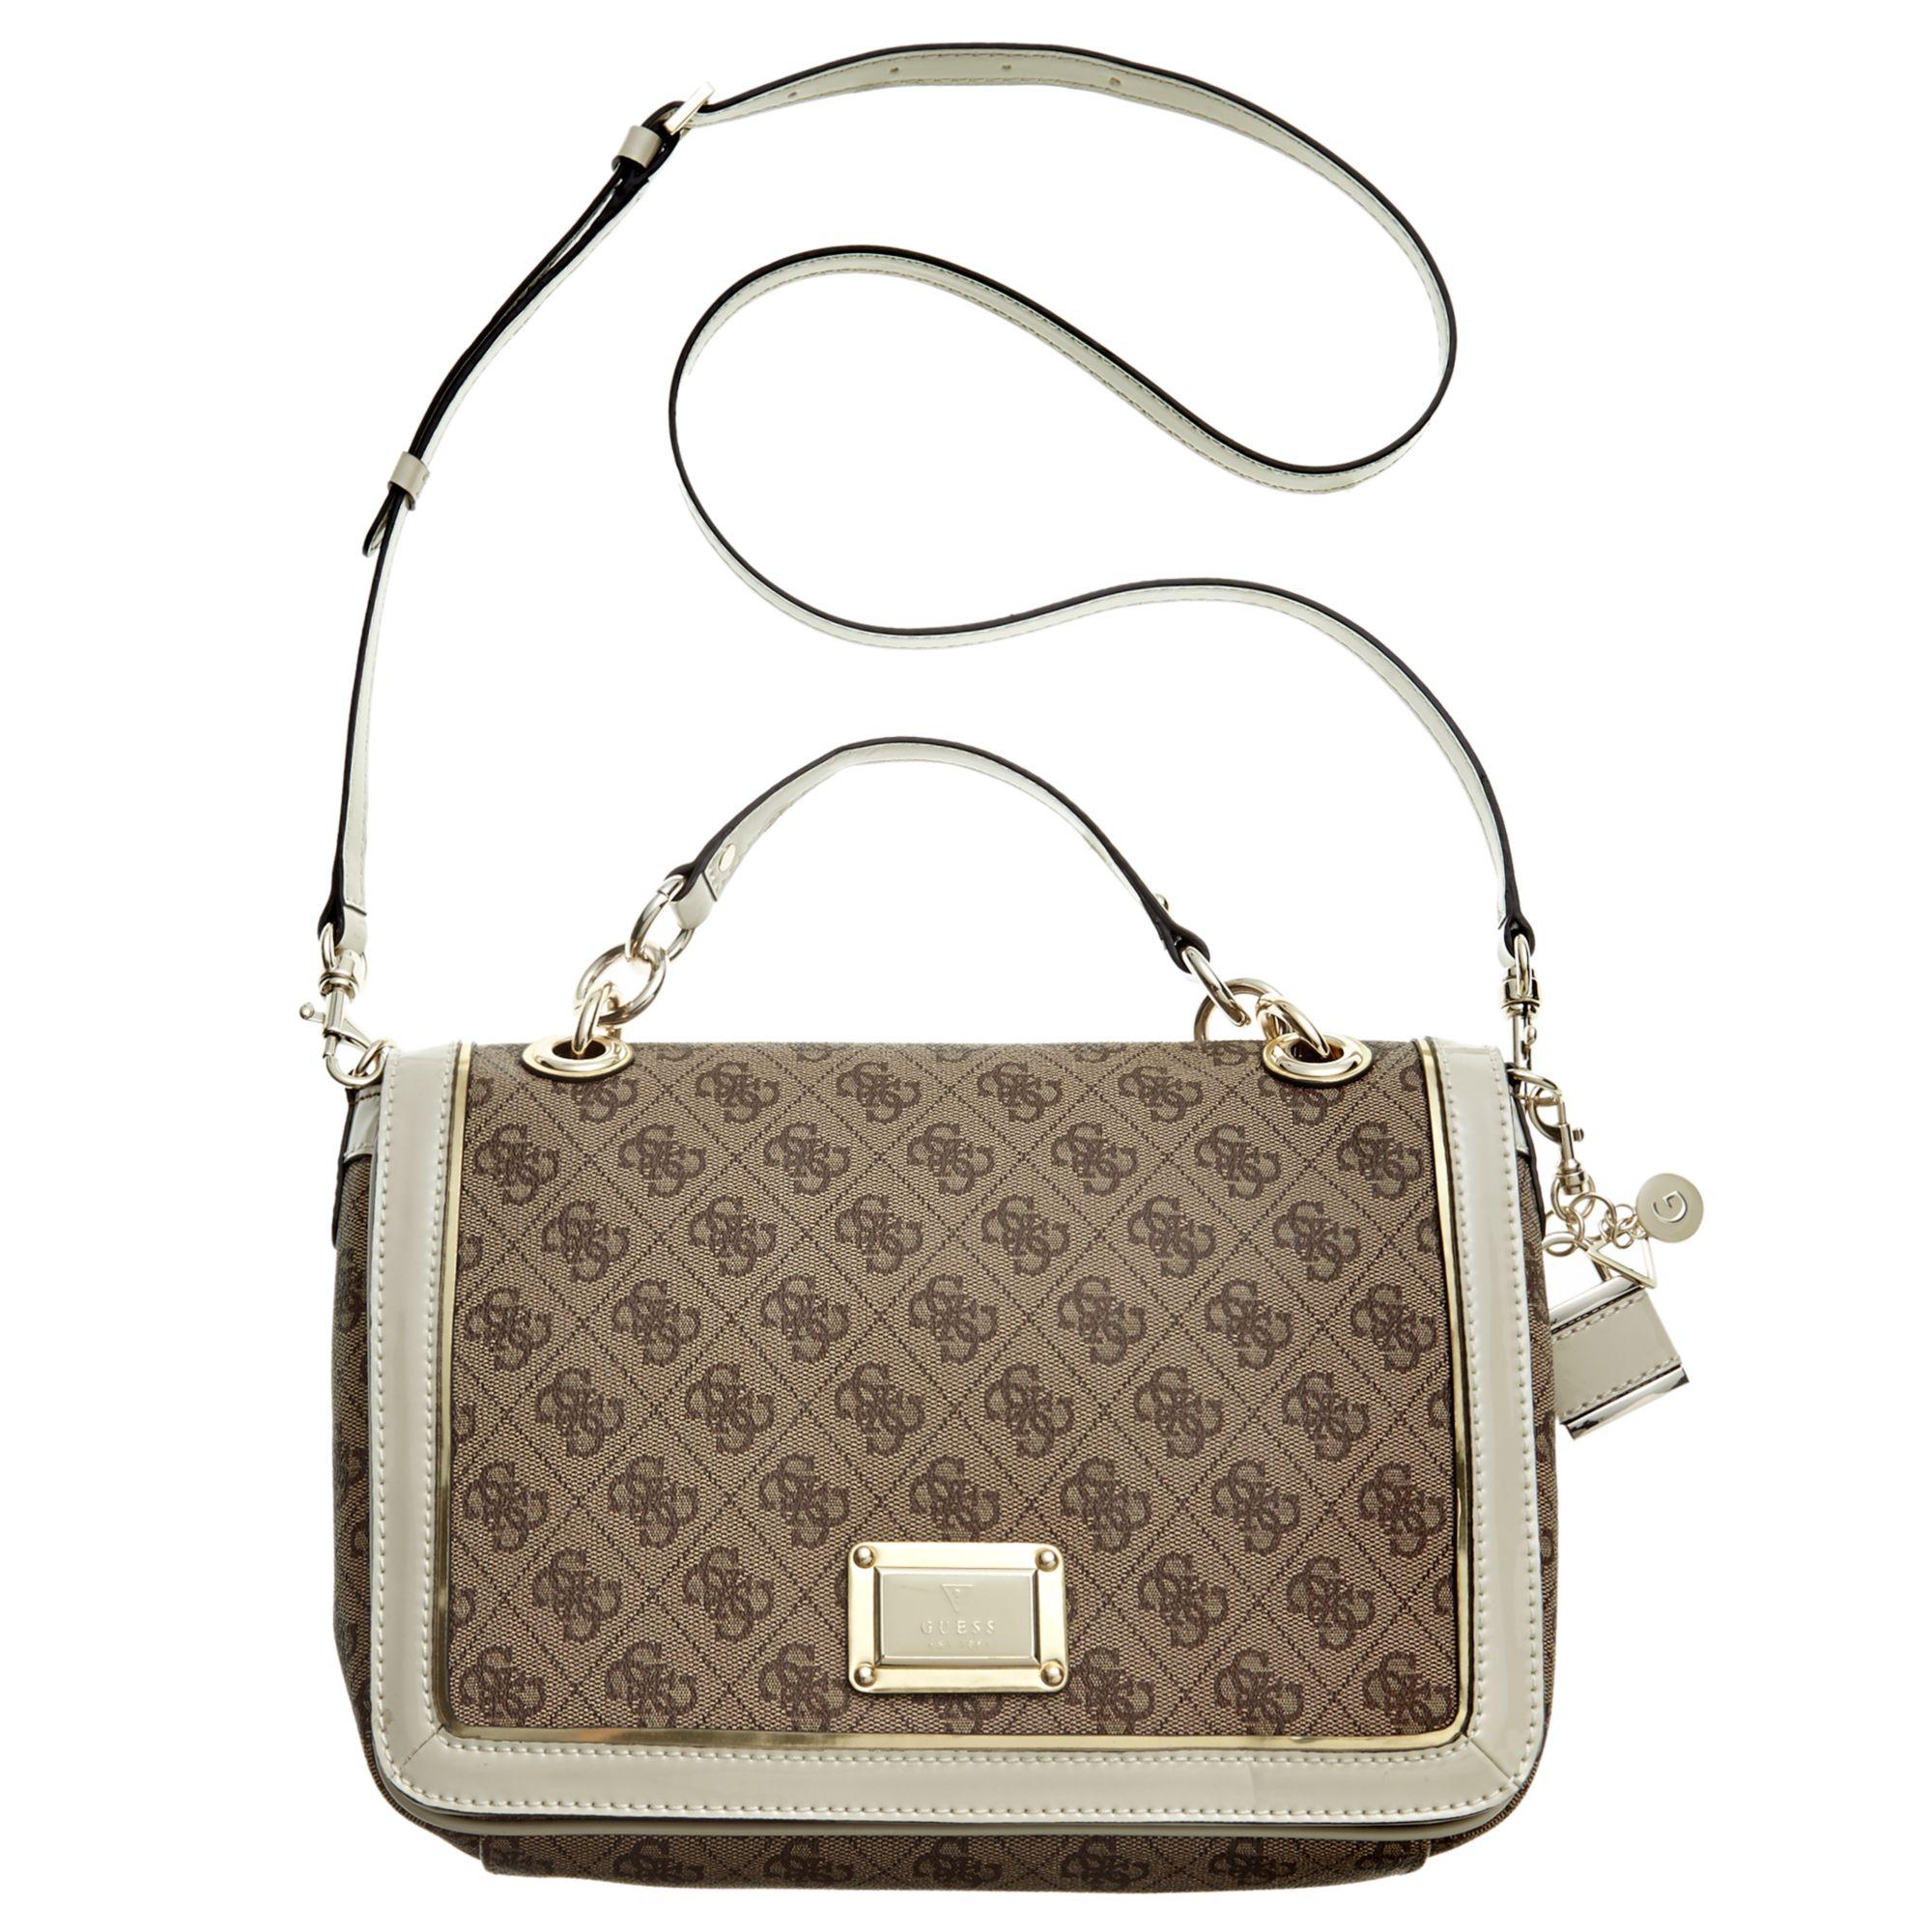 Lyst - Guess Guess Handbag Reama Top Handle Flap Shoulder Bag in White 83832720d1c91